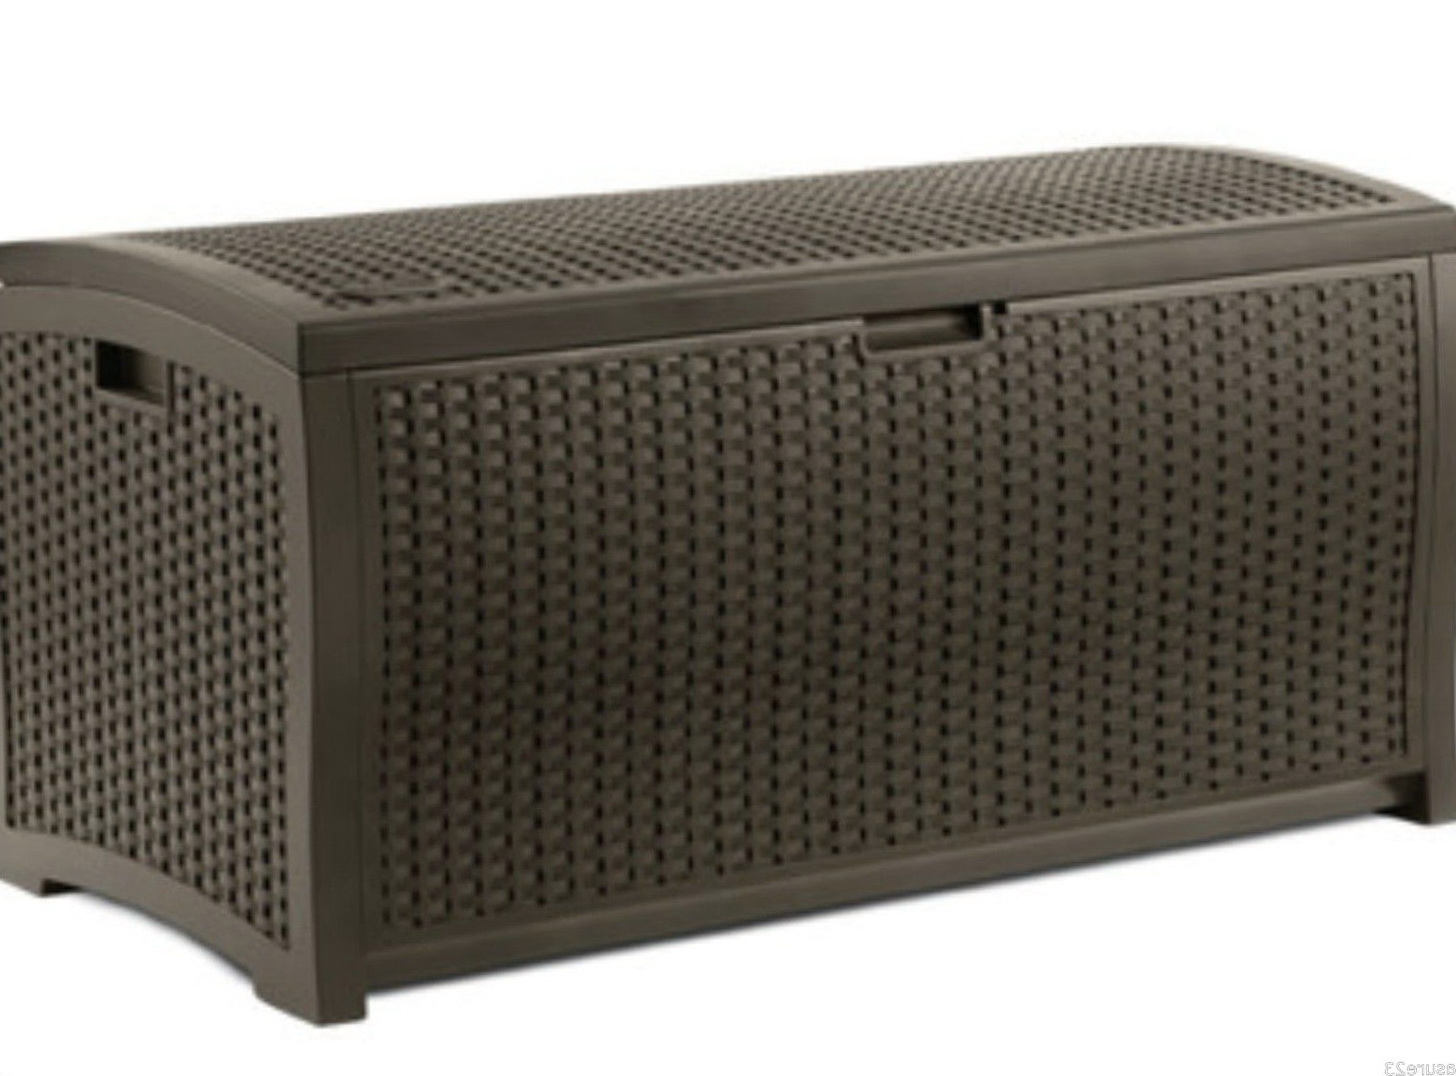 Suncast Deck Box With Seat 99 Gallon